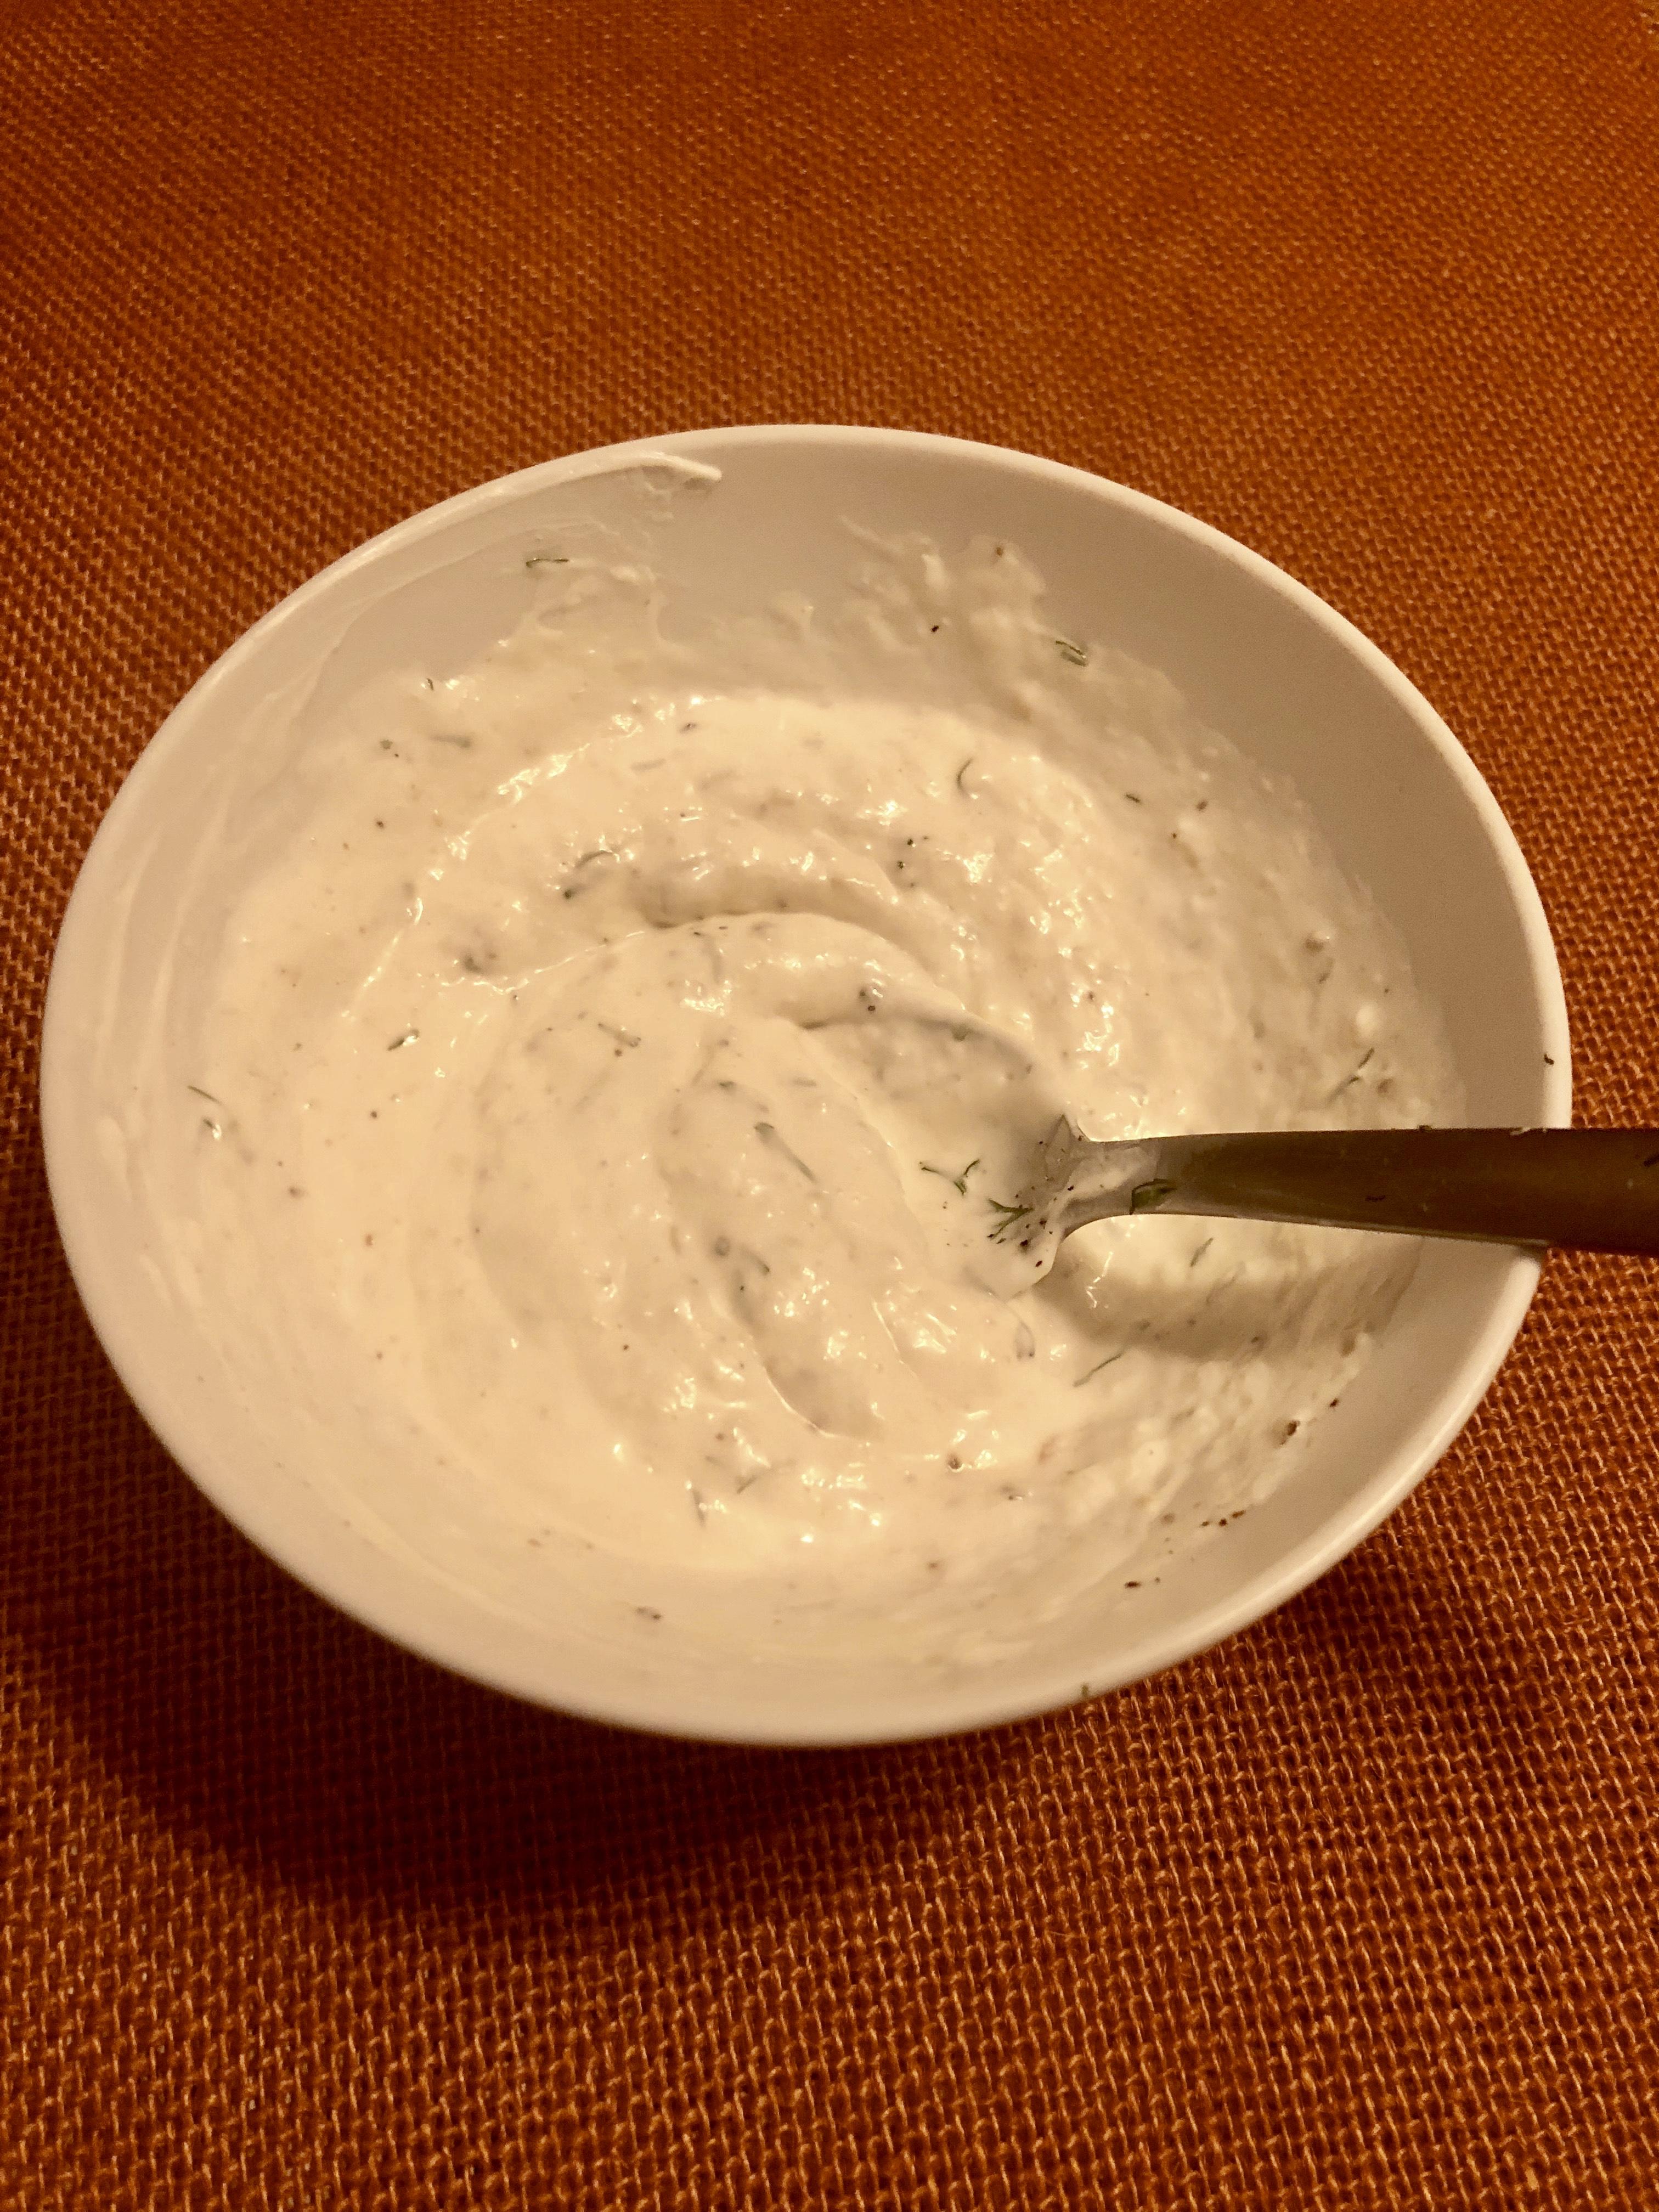 Prime Rib Horseradish Sauce